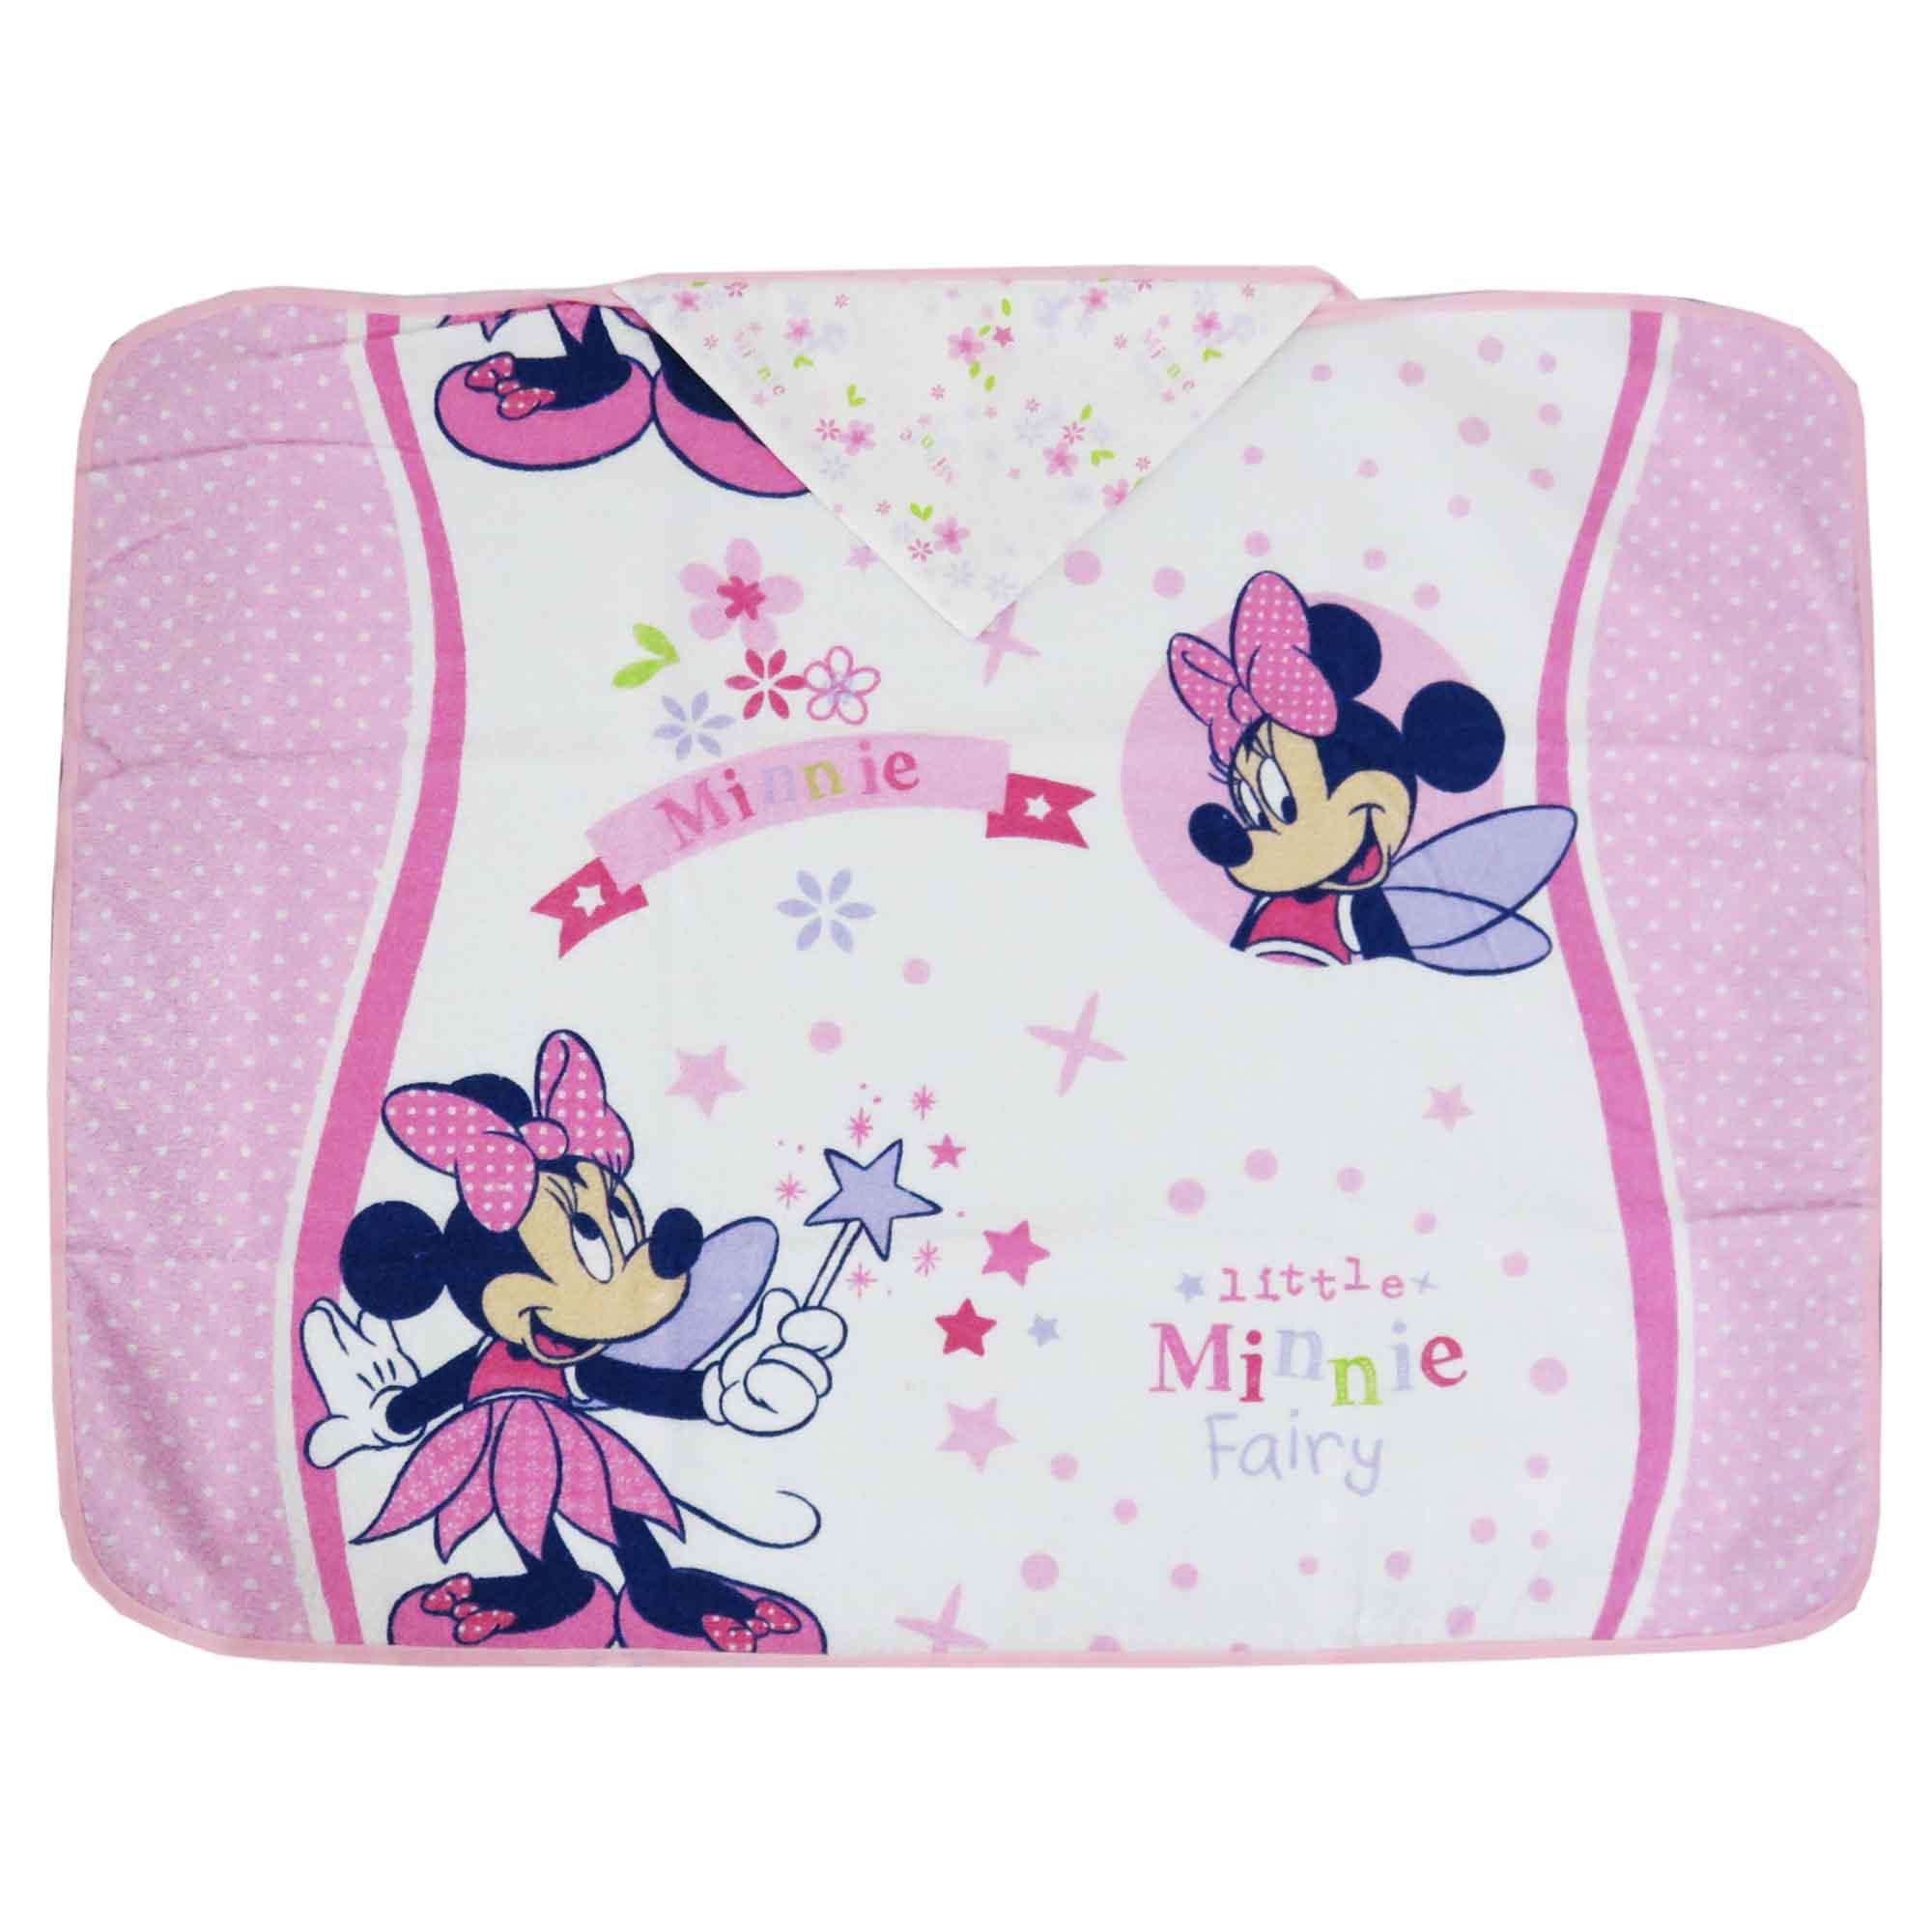 Toalha Estampada Minasrey Disney Com Forro em Fralda - Minnie